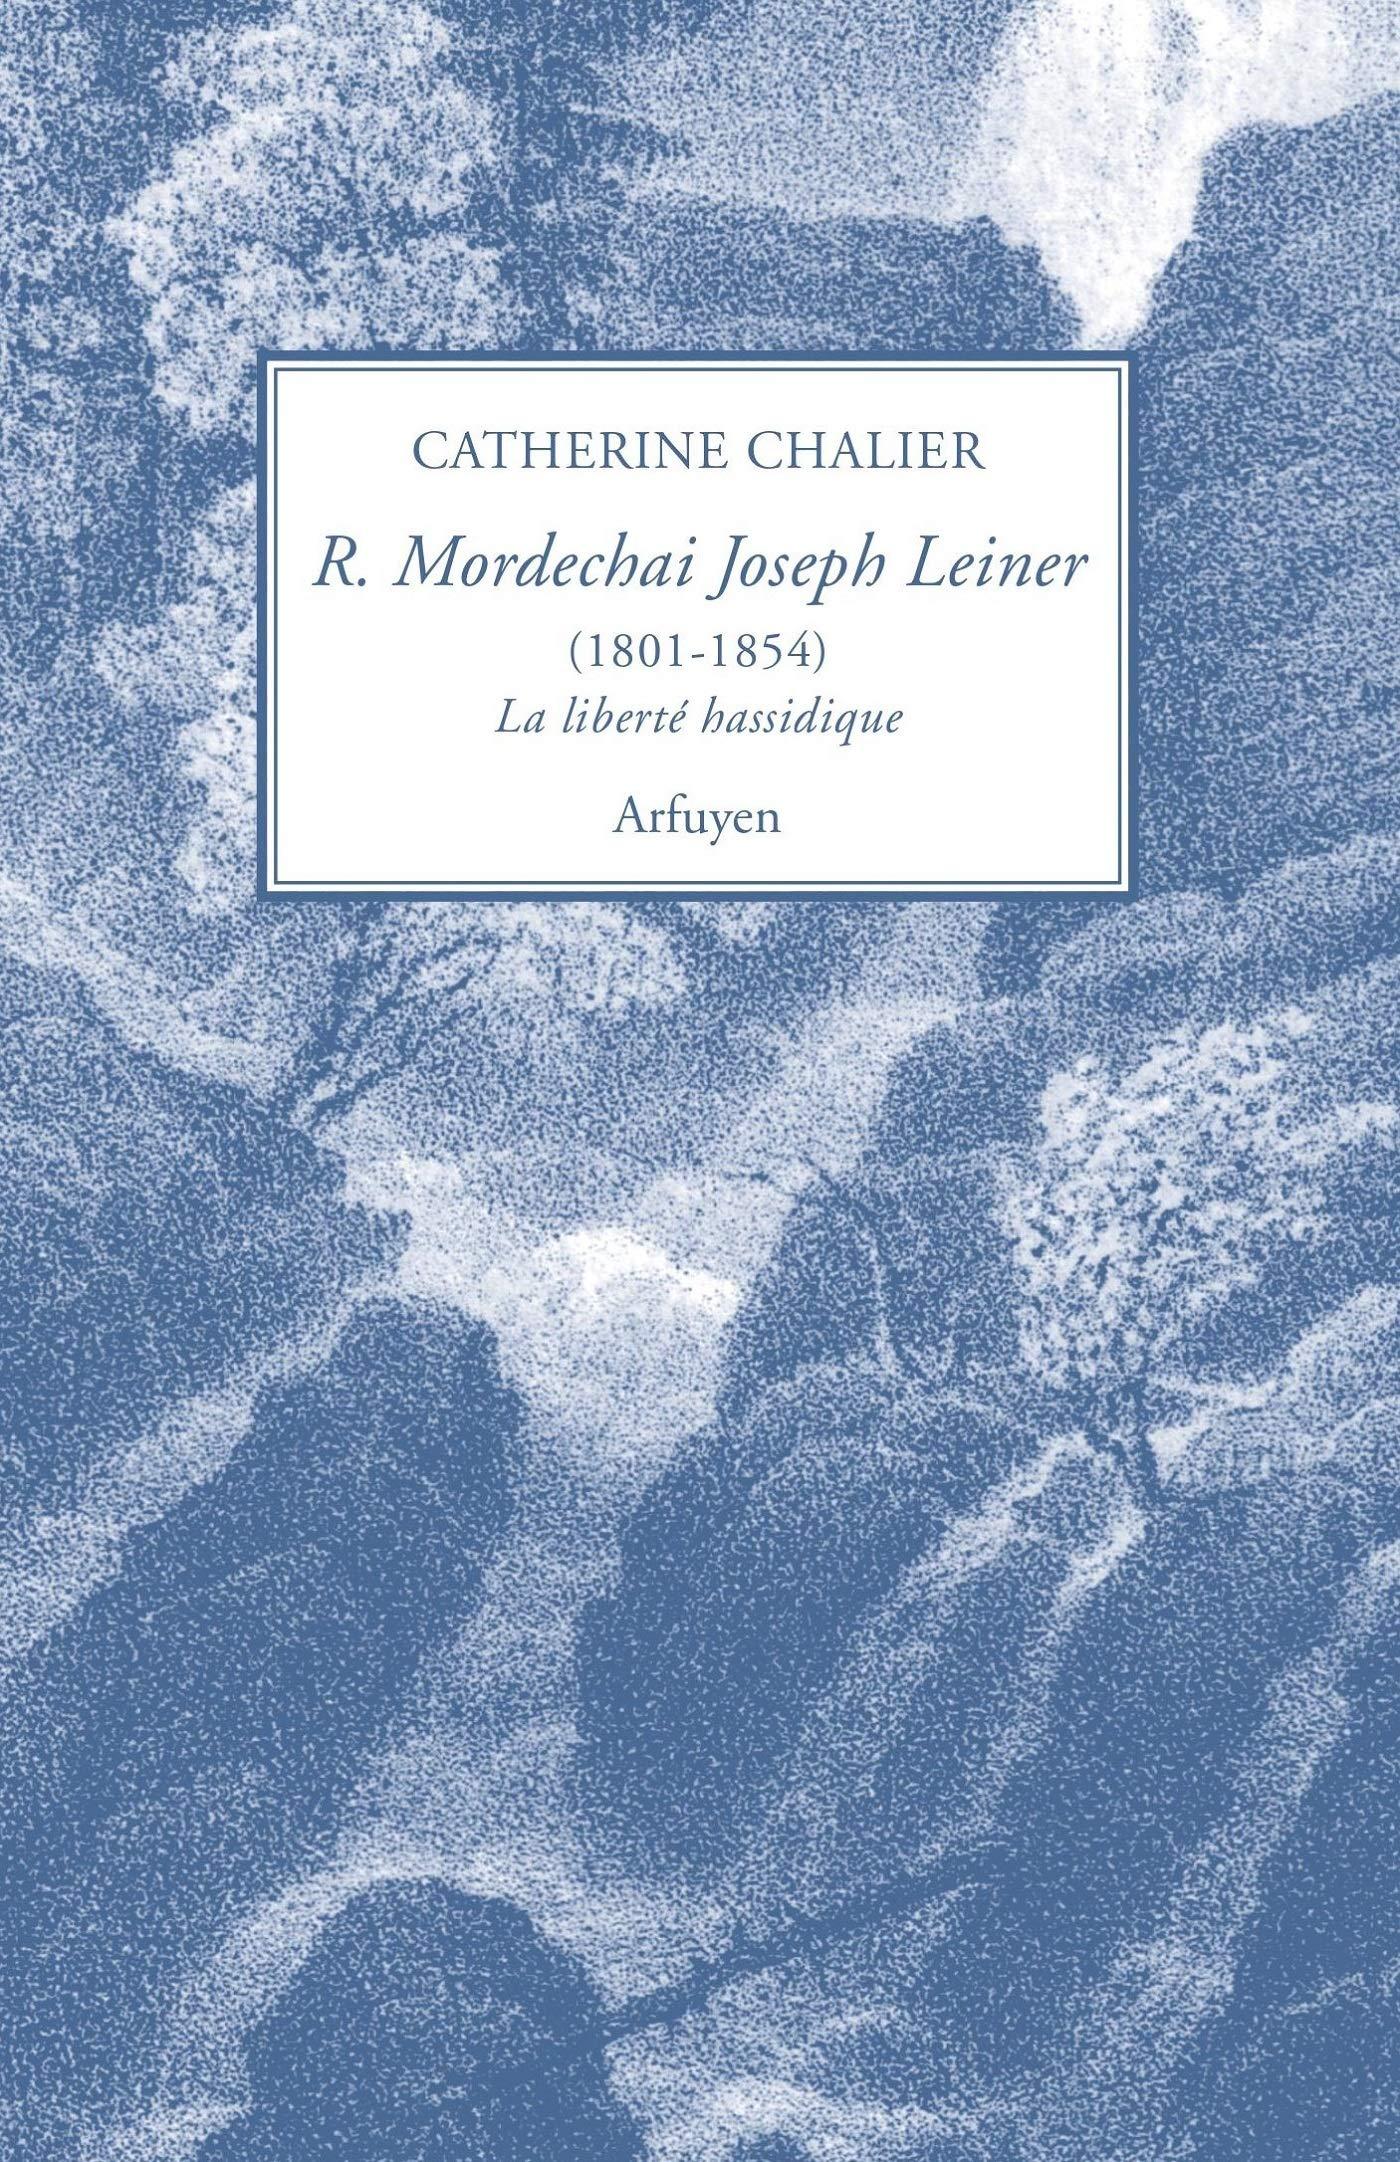 Rav Mordechai Joseph Leiner - Catherine Chalier